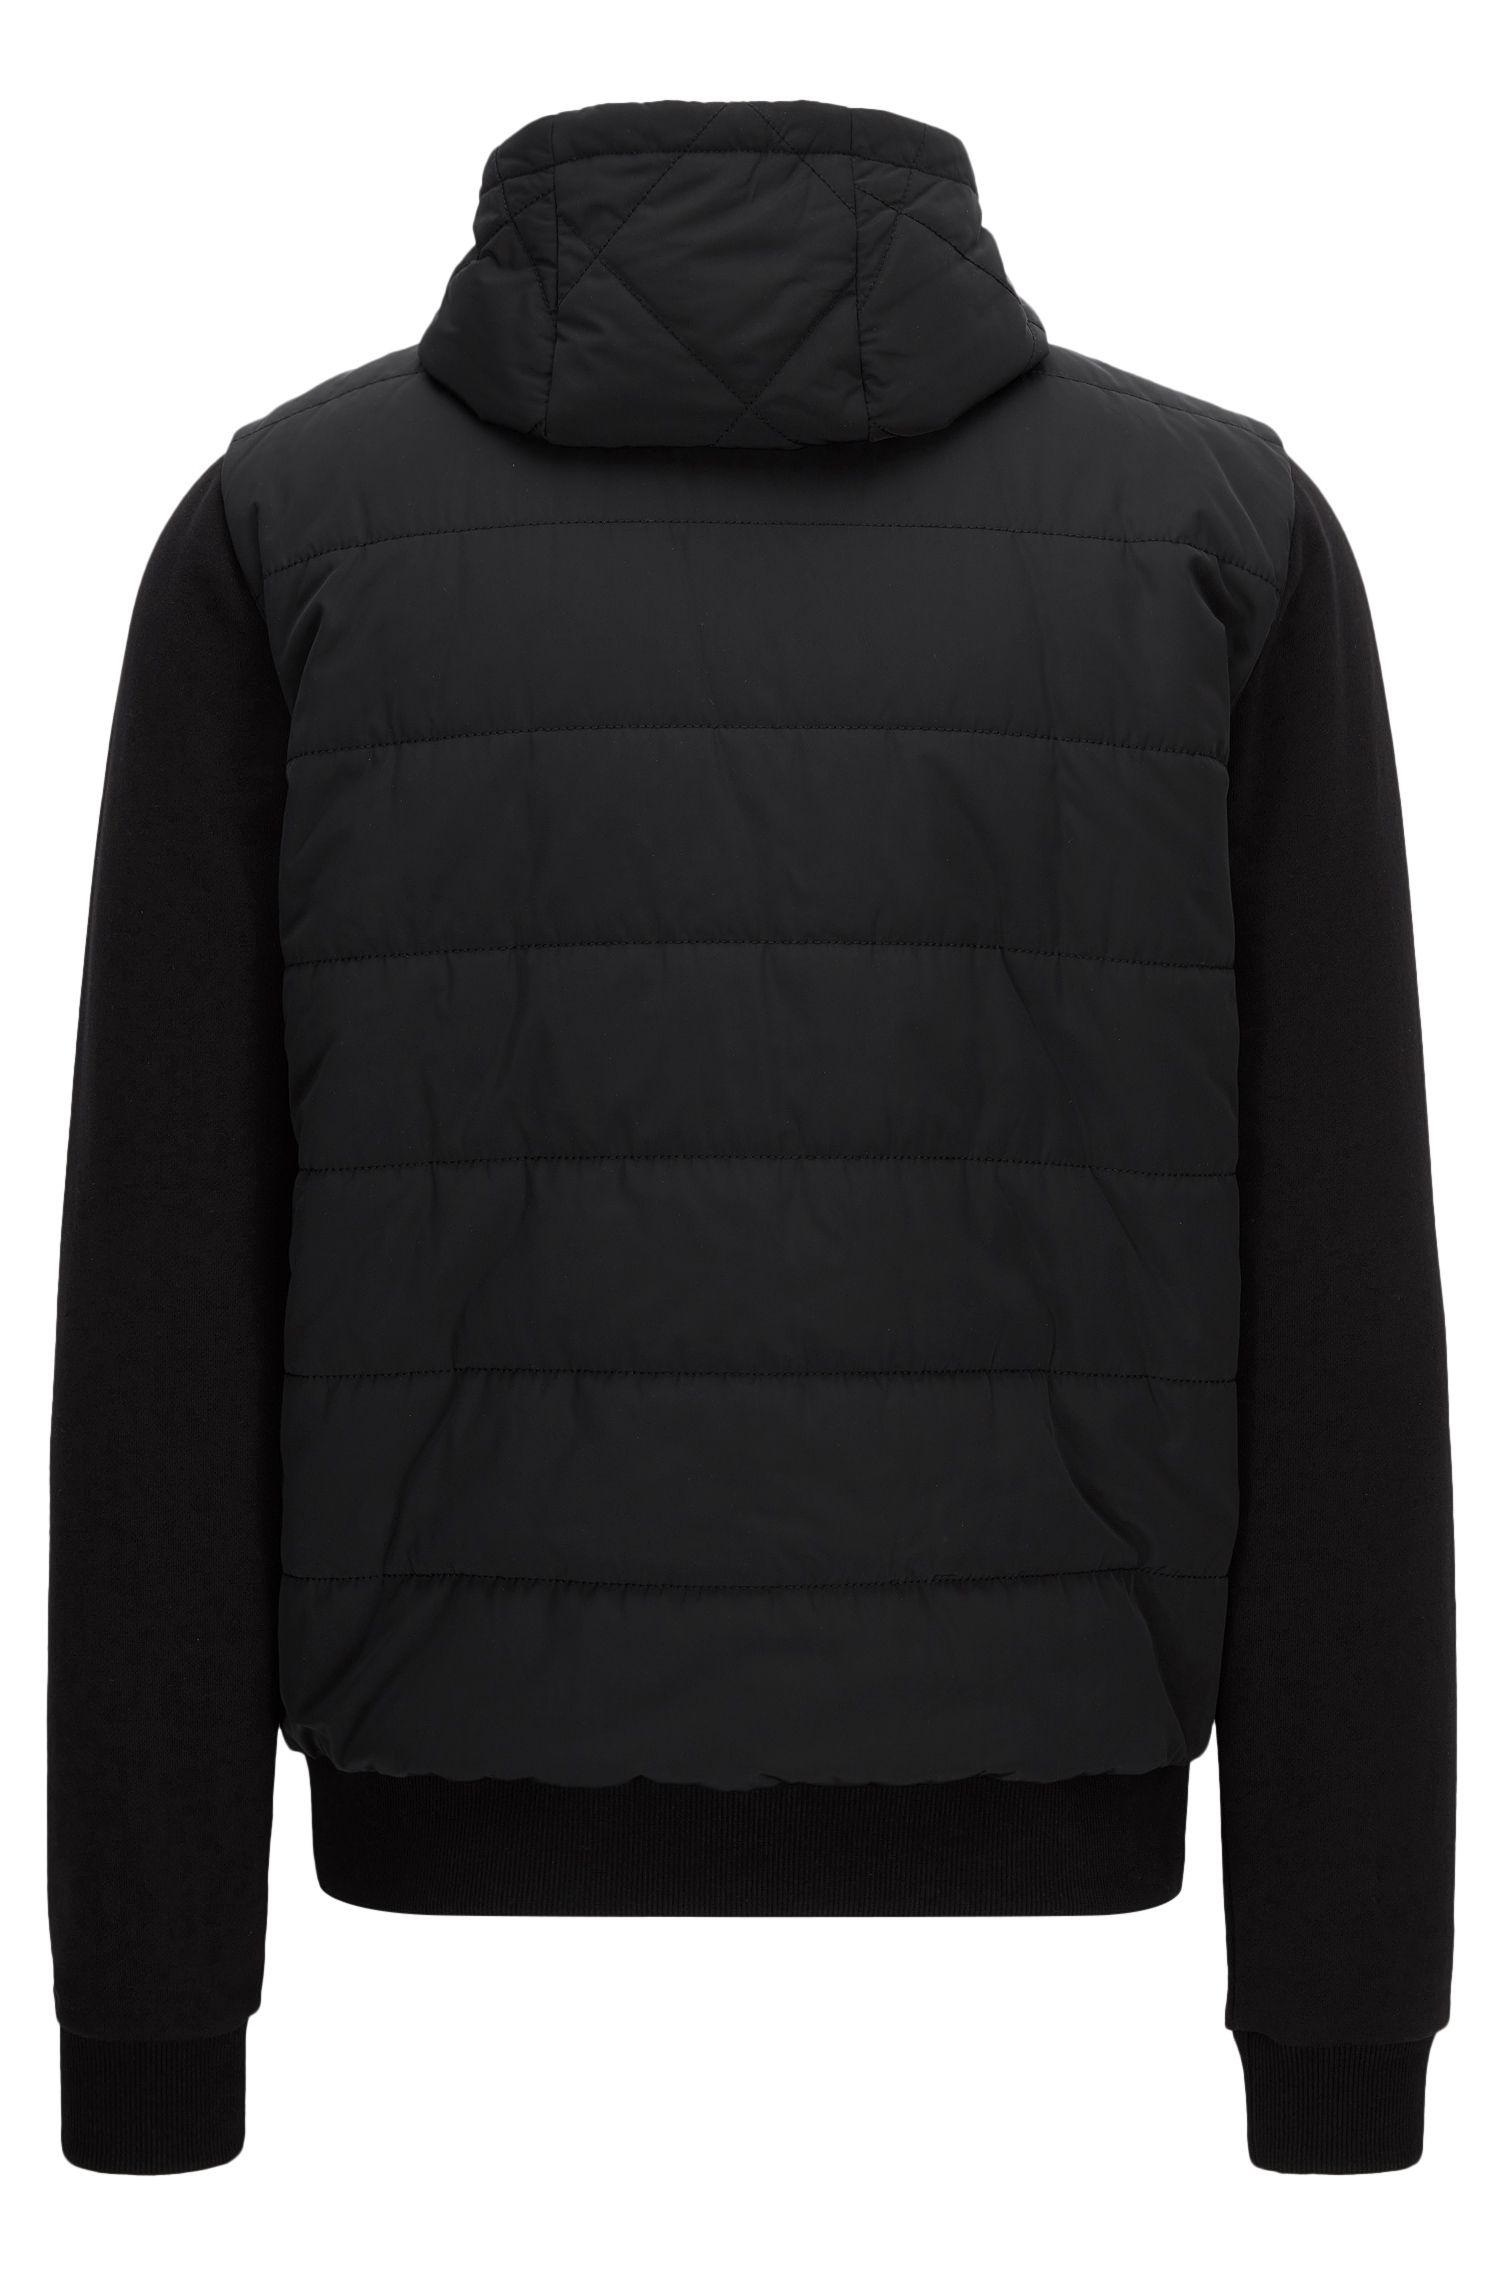 'Skiles' | Nylon Zip Jacket